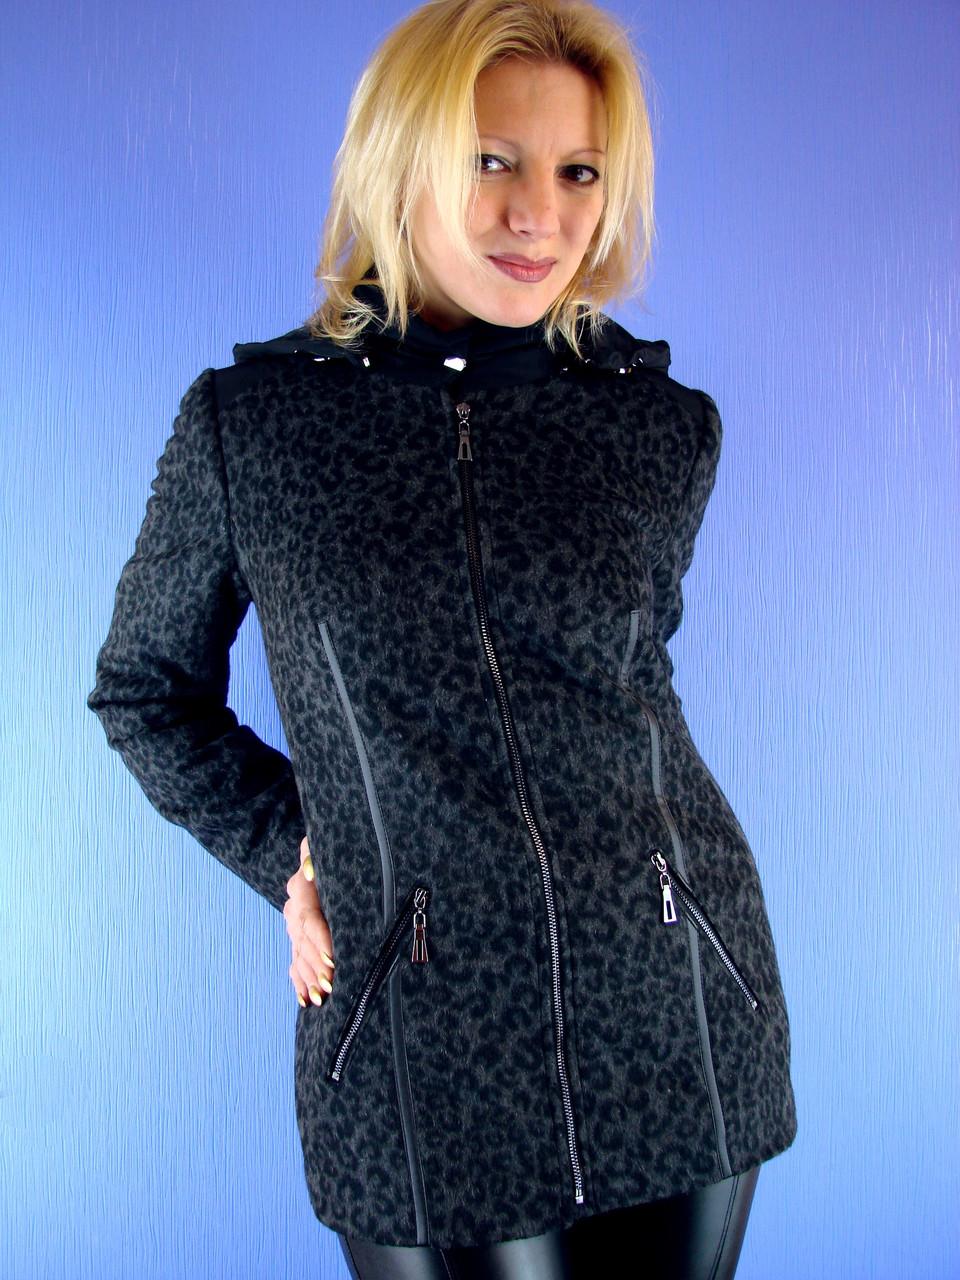 1aea20005b3 Женская куртка полу пальто Olmar 04. Разм. 46-58 Deify